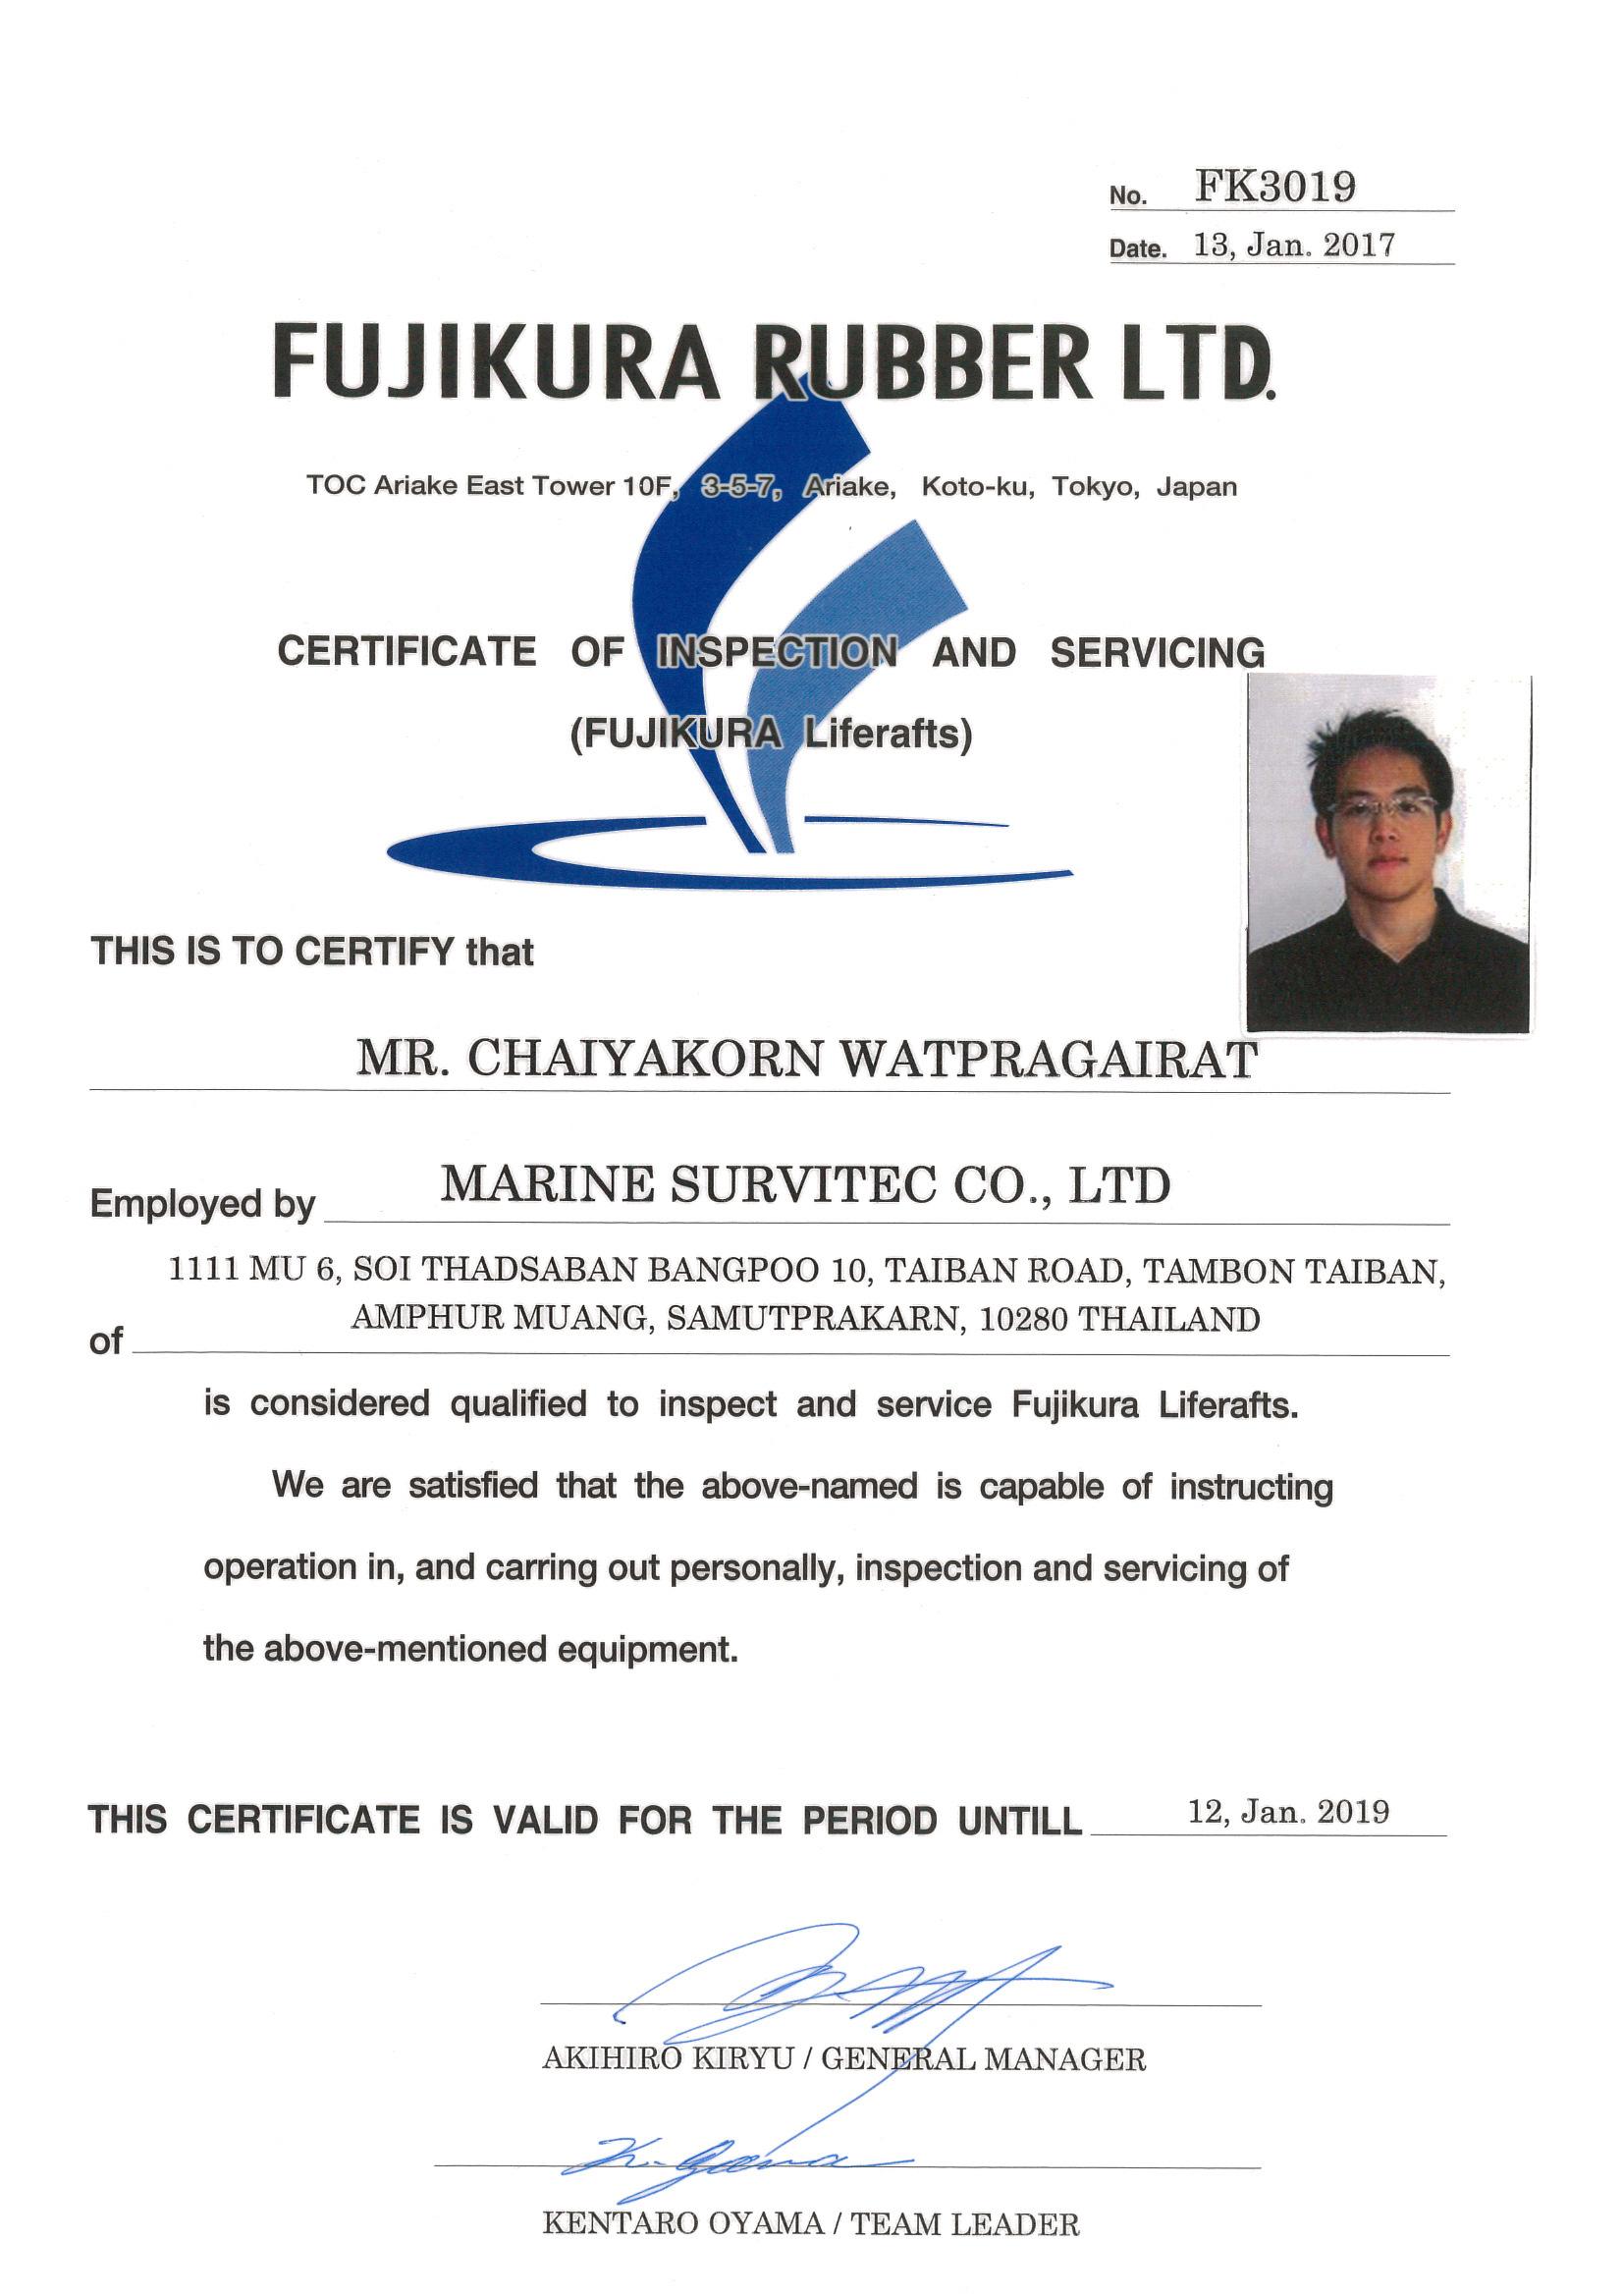 FUJIKURA-ACT